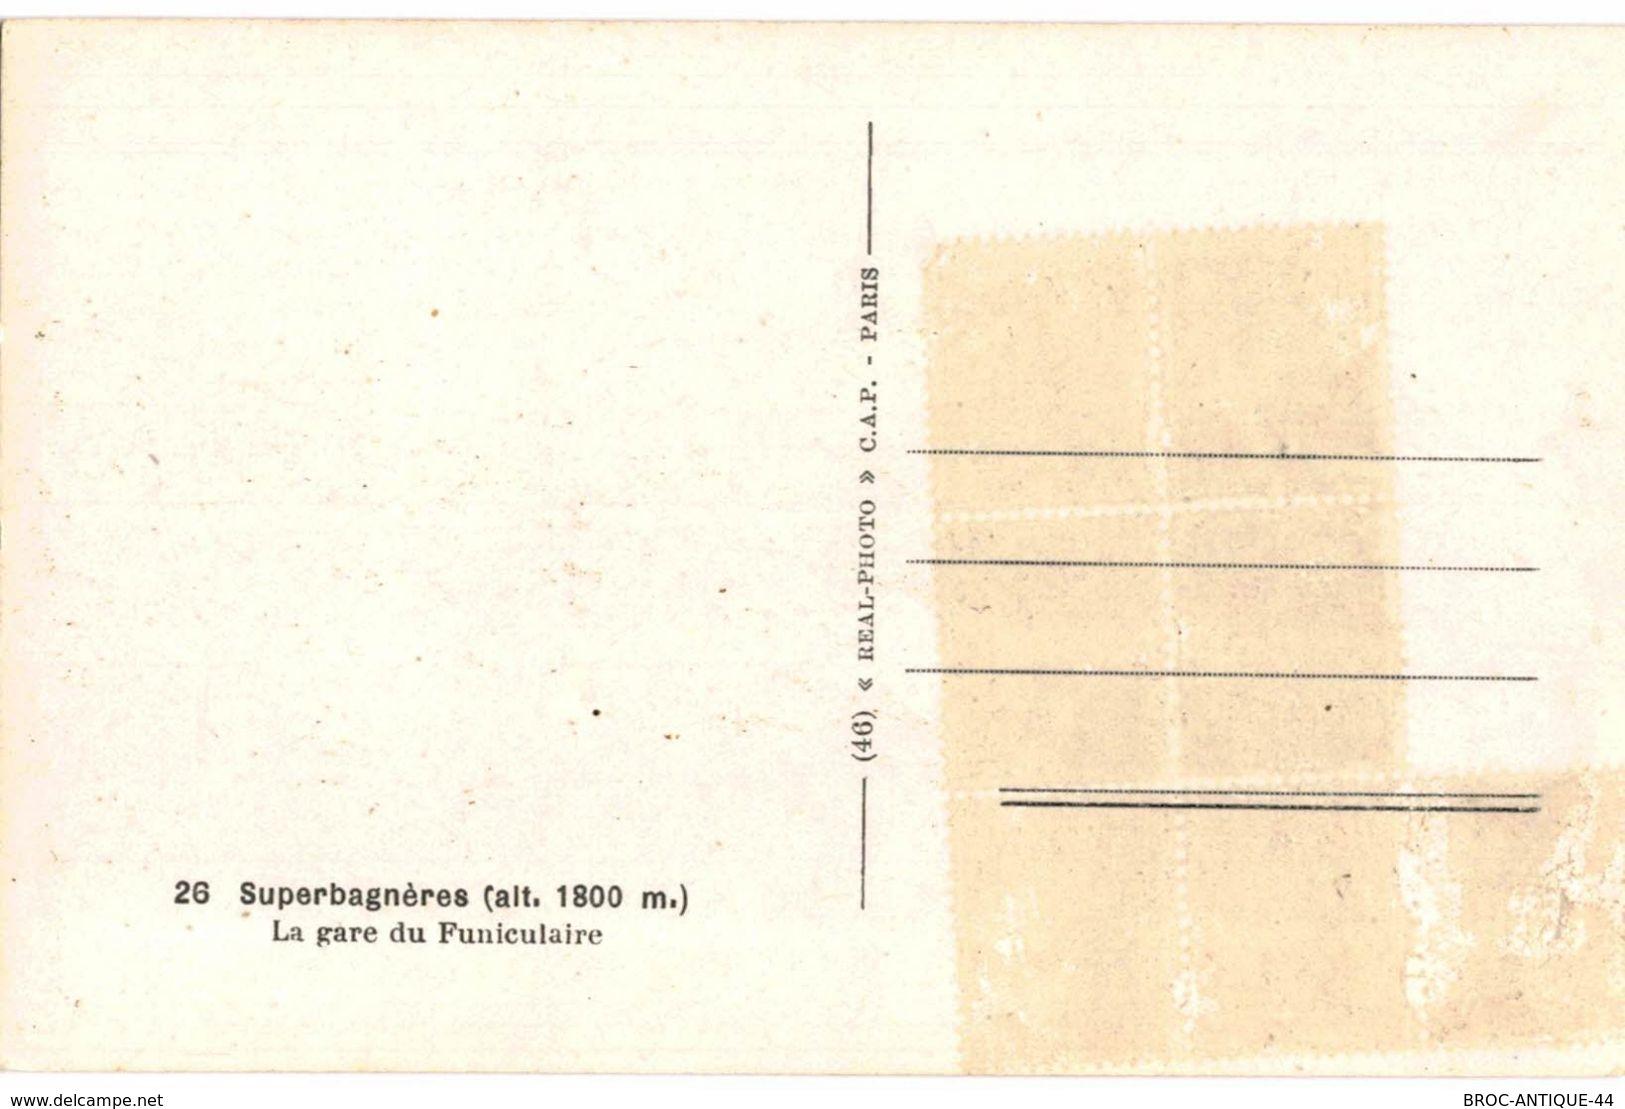 CPA N°16136 - LOT DE 3 CARTES DE SUPERBAGNERES - CHEMIN DE FER DE SUPERBAGNERES + GARE DU FUNICULAIRE - Superbagneres